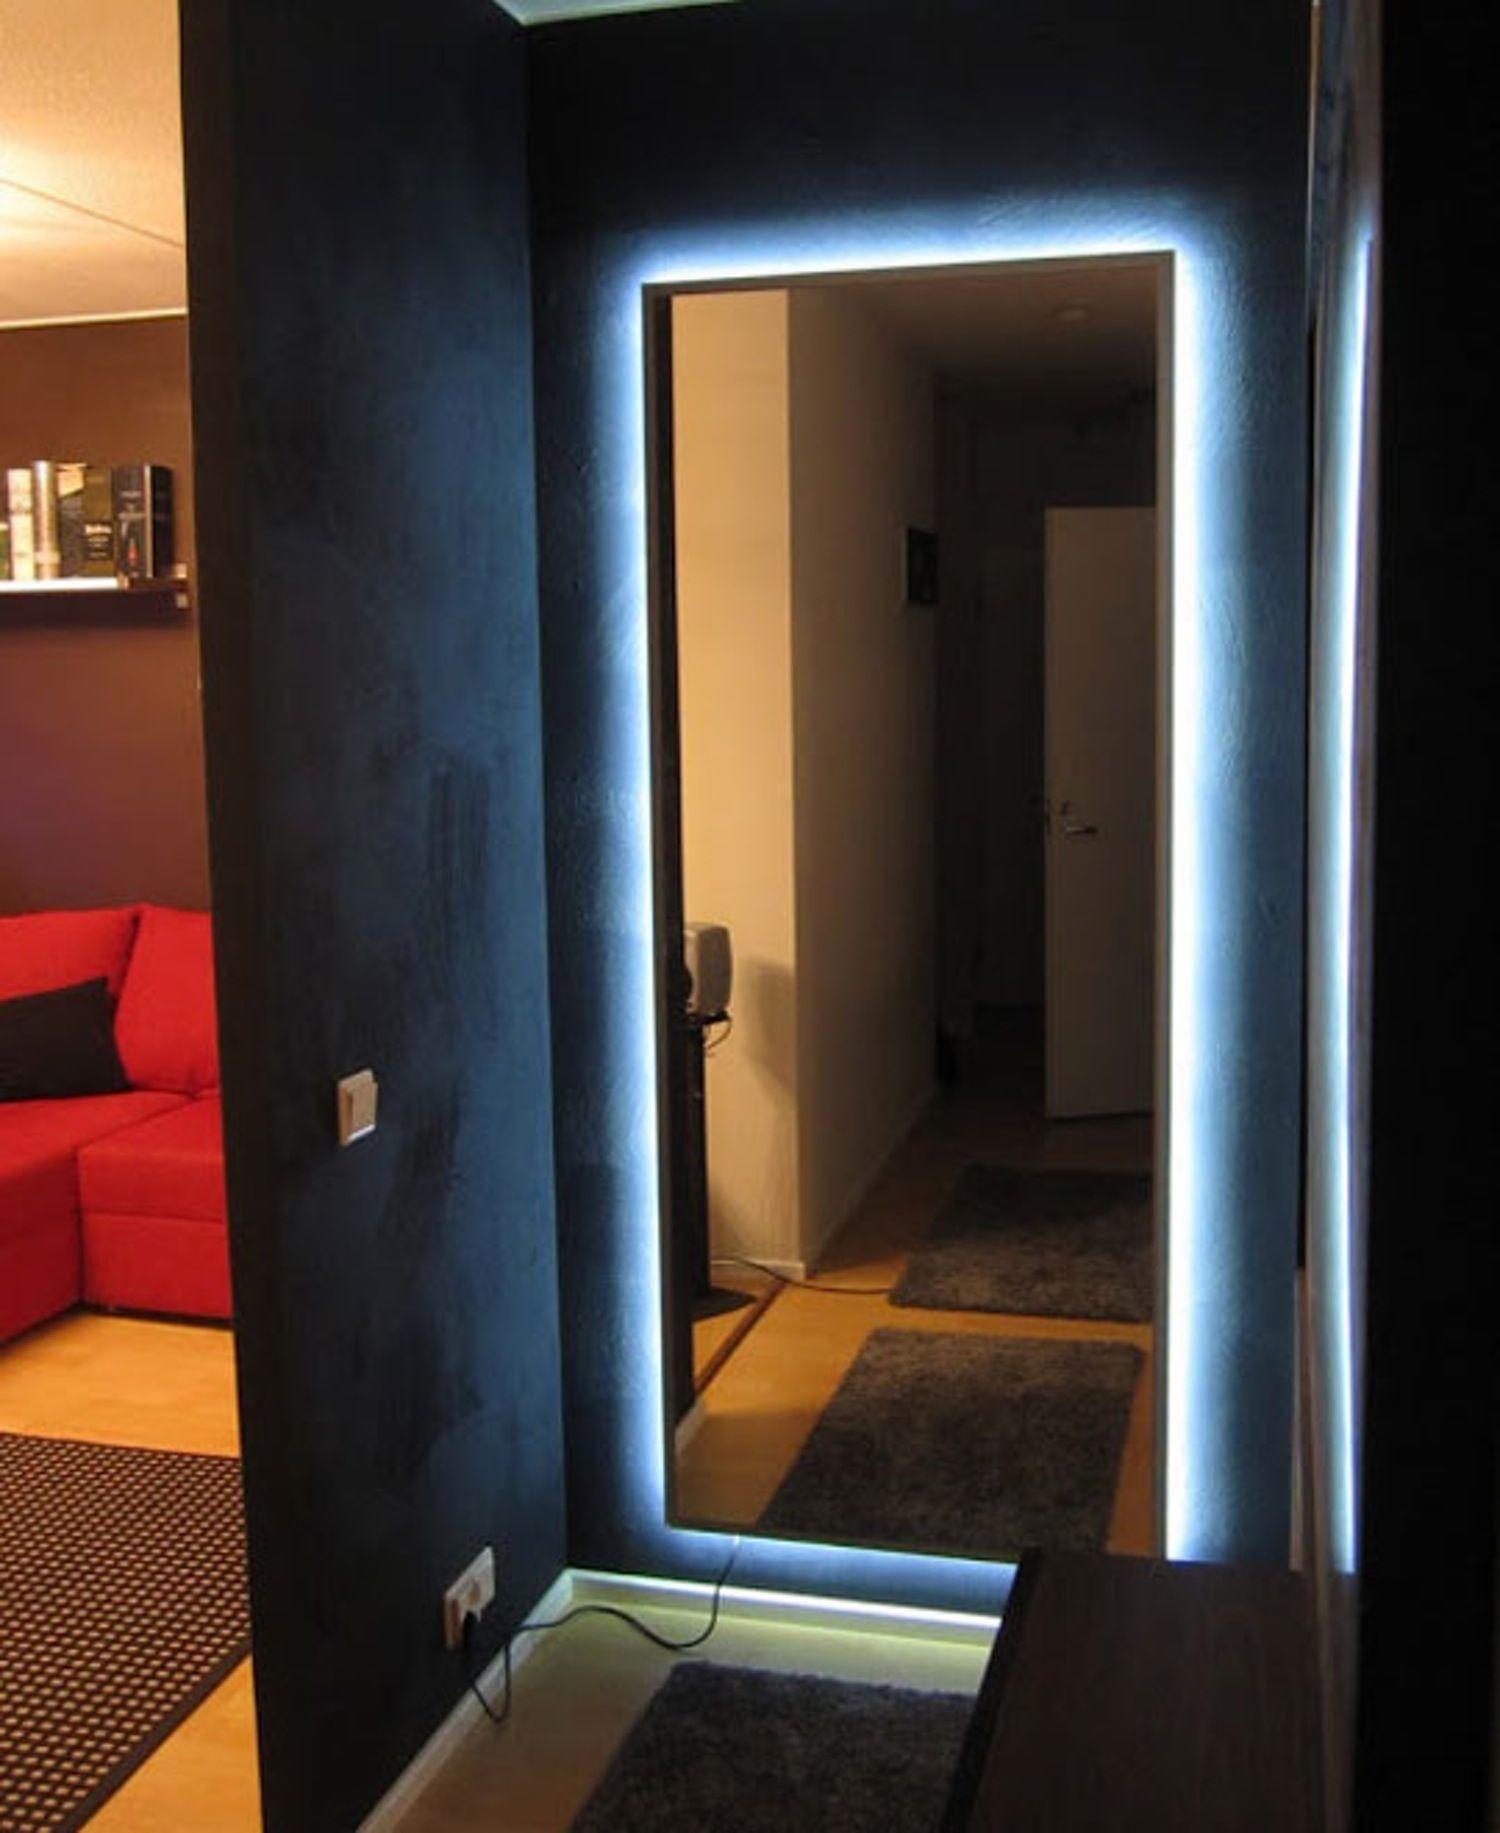 Ikea Mirror Transformed With Nightclub Chic Led Lighting Bedroom